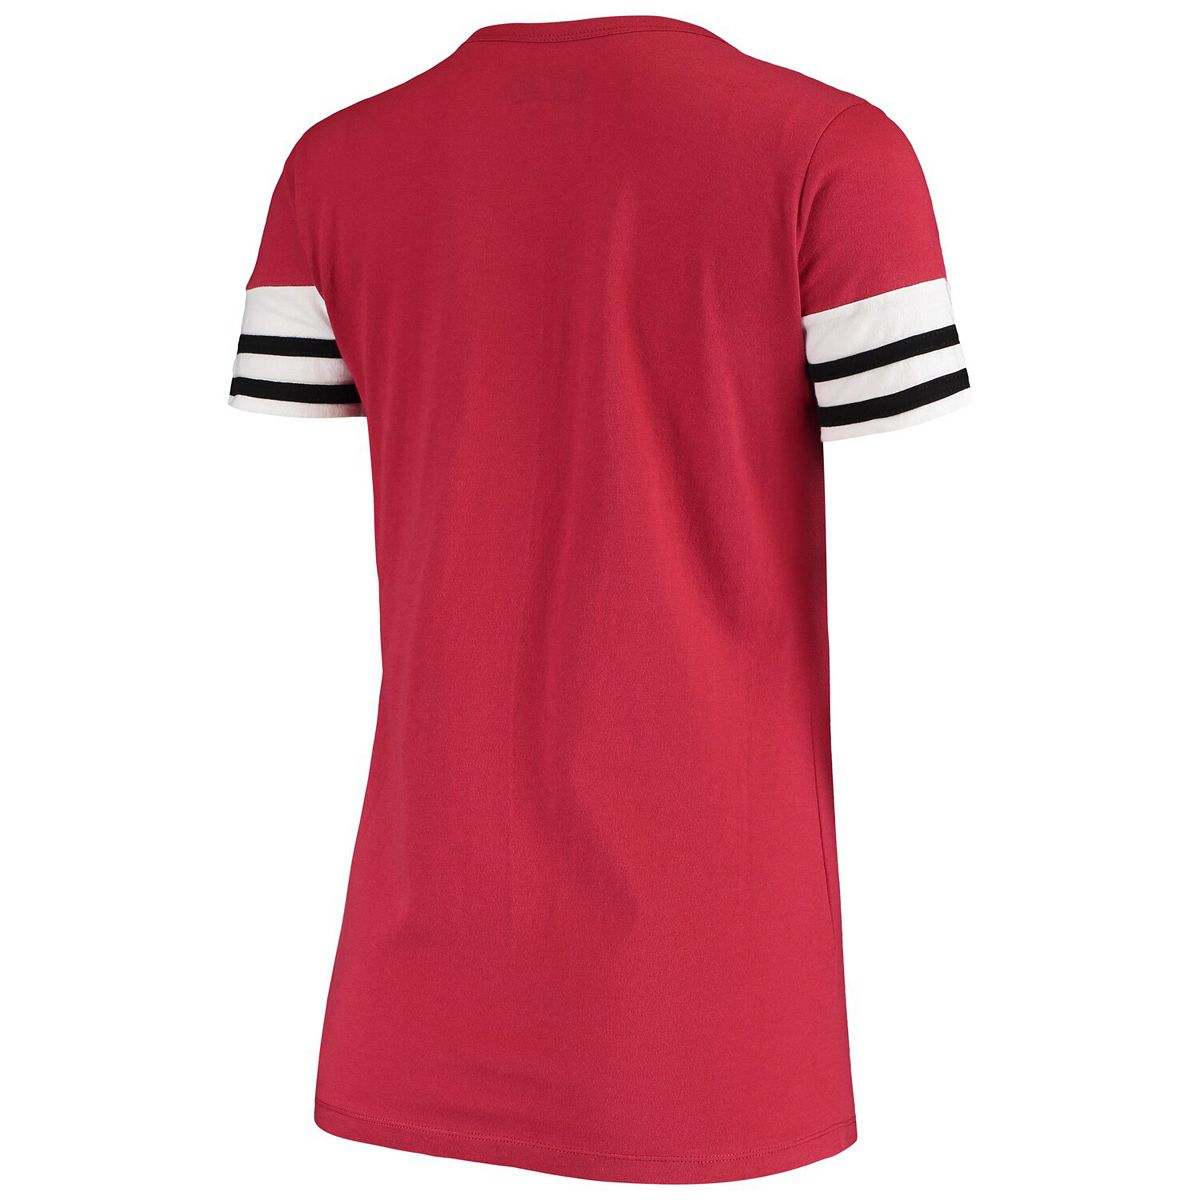 Women's New Era Cardinal Arizona Cardinals Contrast Sleeve Stripe V-Neck T-Shirt PAAZX